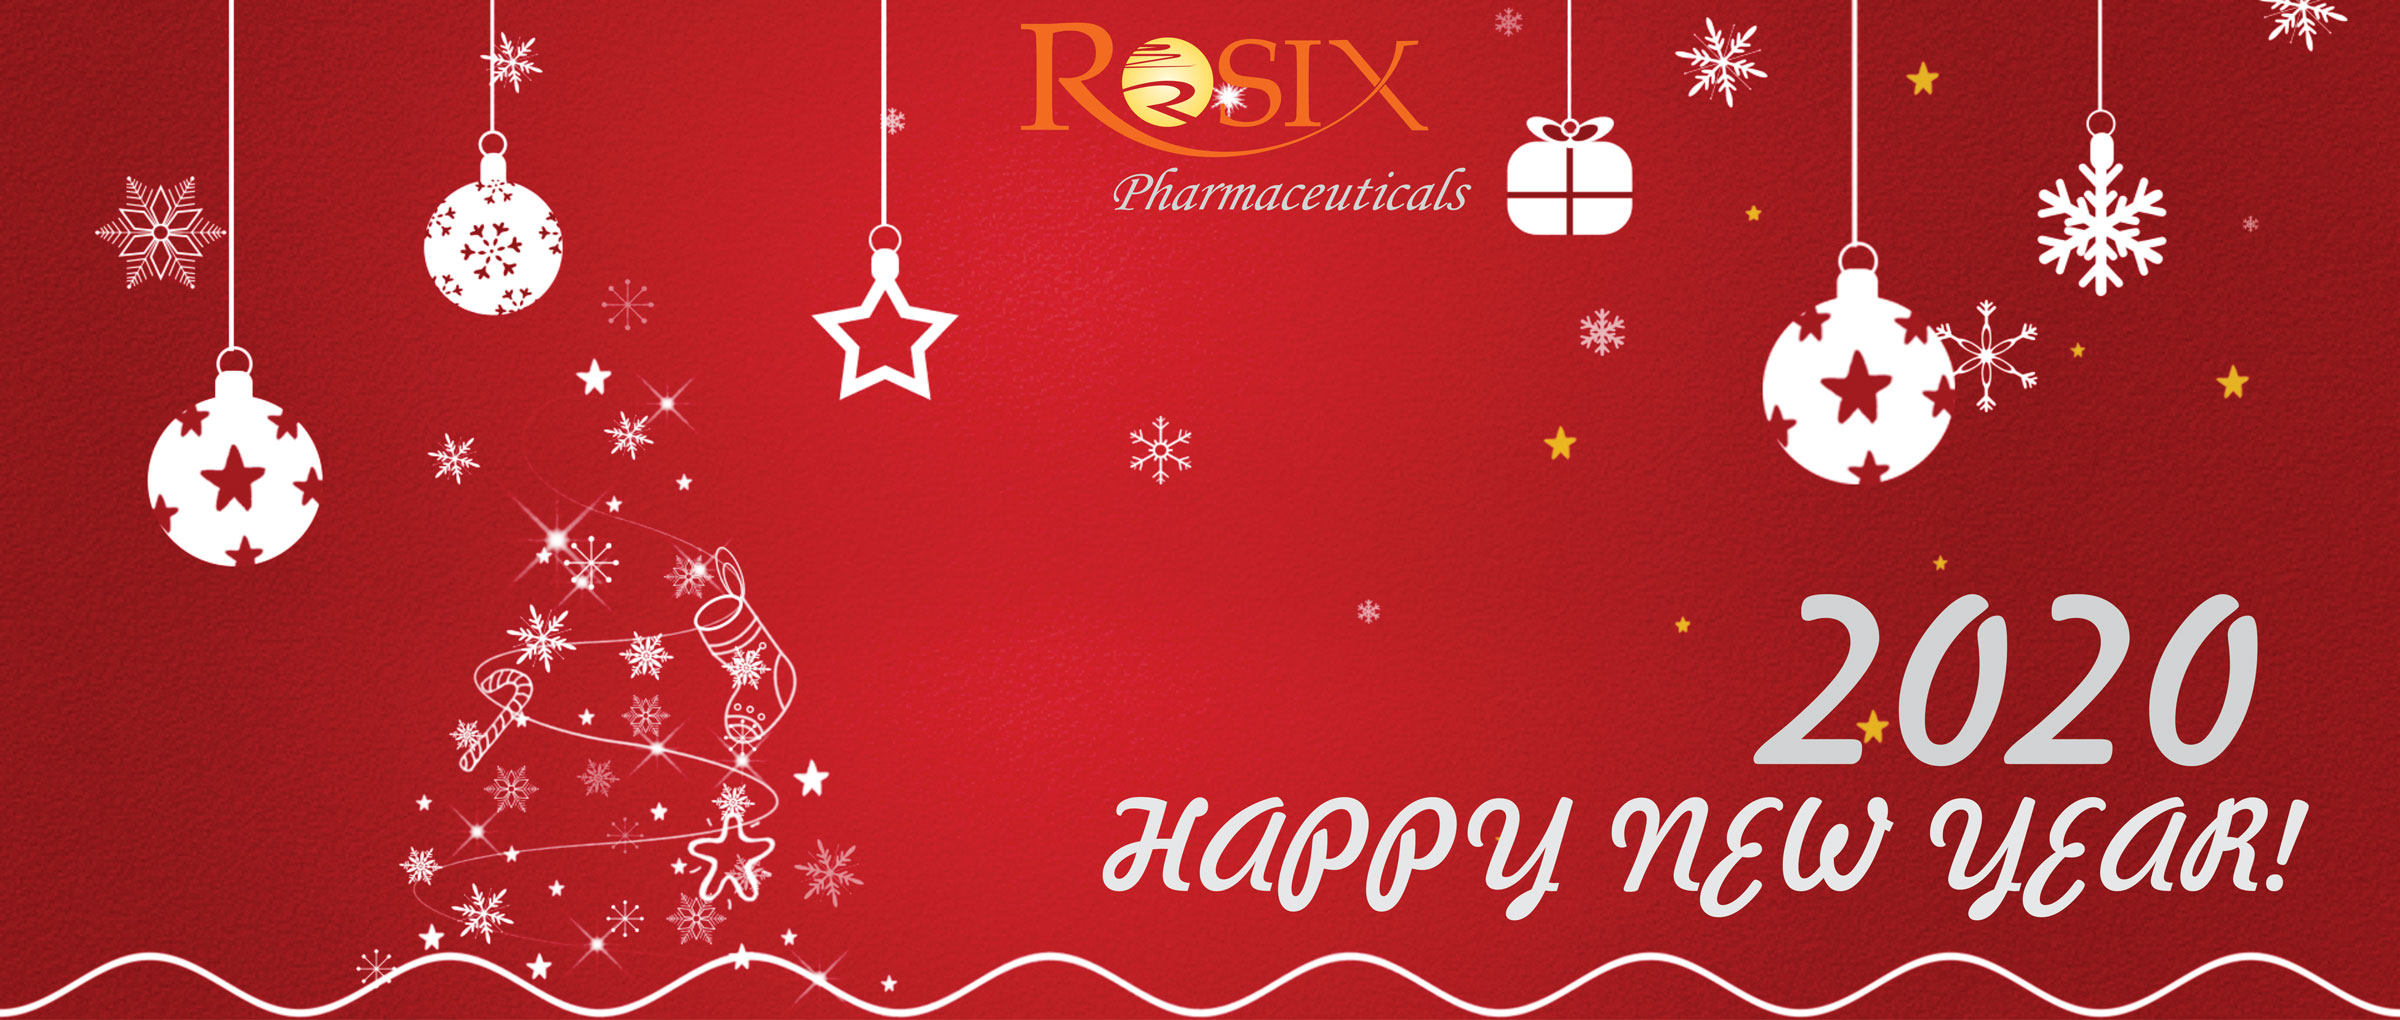 http://www.rosix.com.vn/danh-sach-san-pham.html